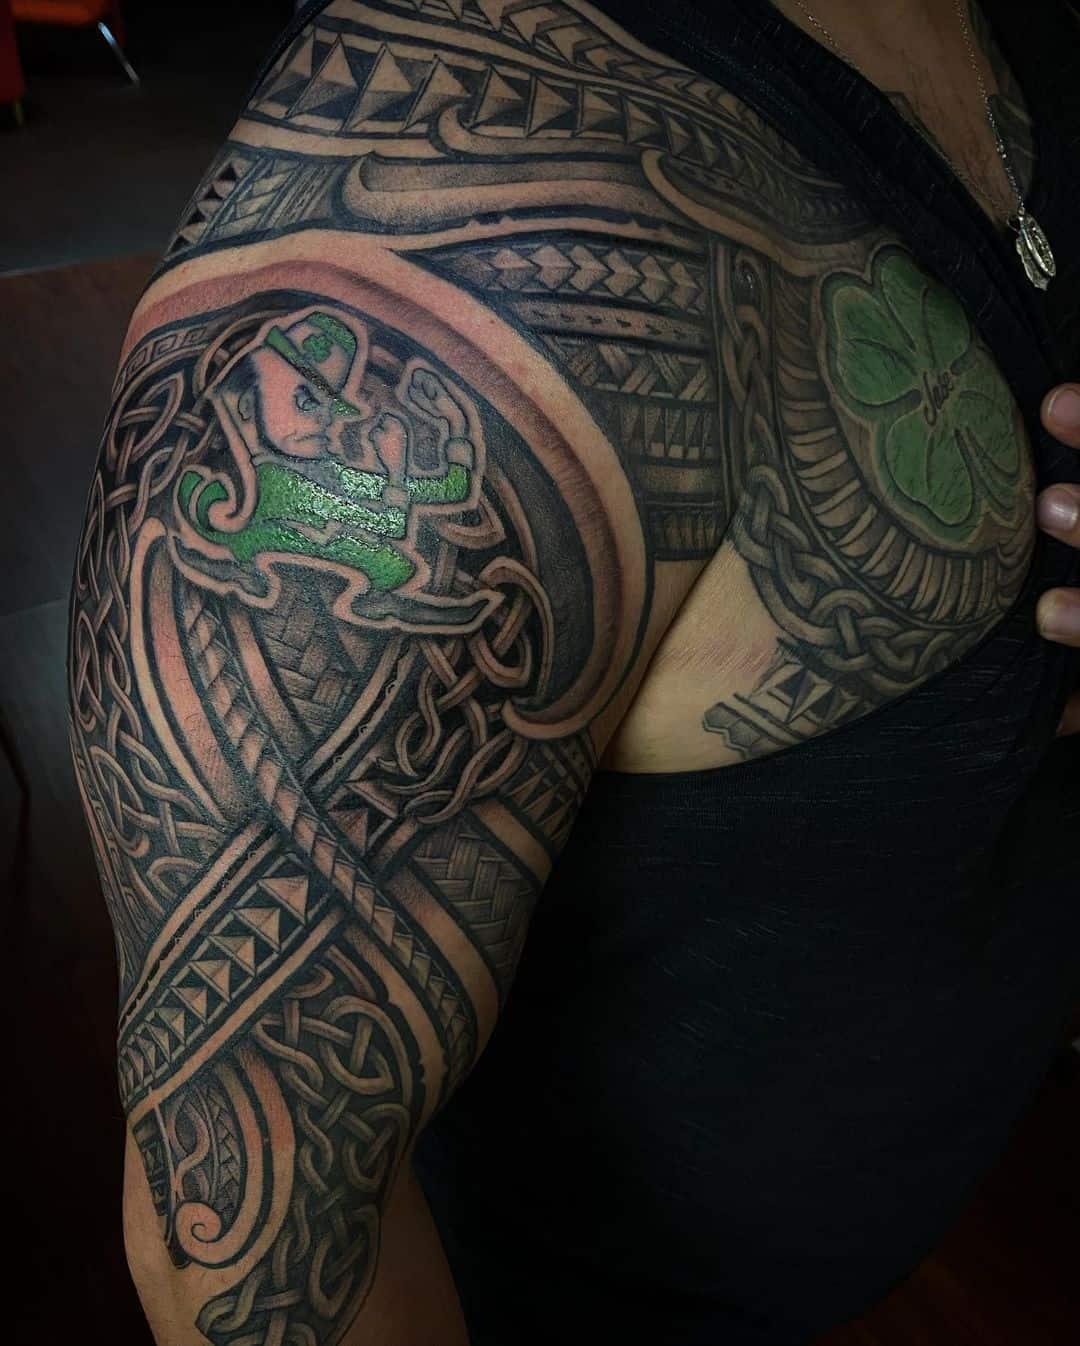 Traditional Celtic Tattoos Scottish Celtic Tattoos Green Ink